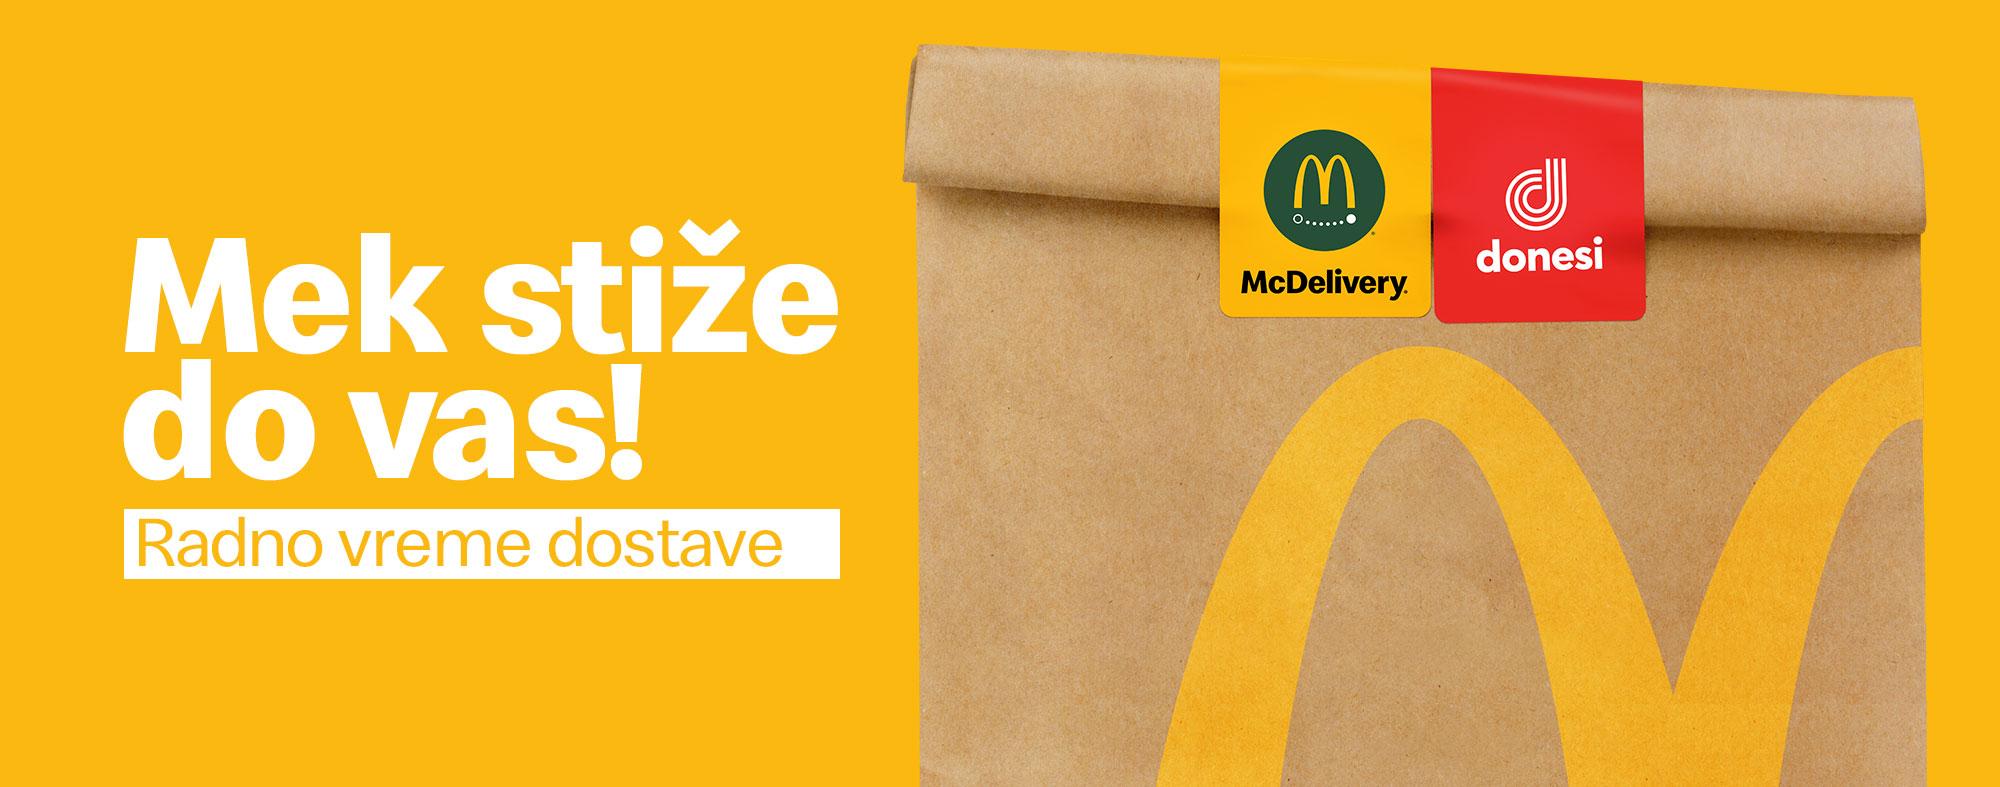 MCD-Slider_Delivery-i-Donesi_2000x787